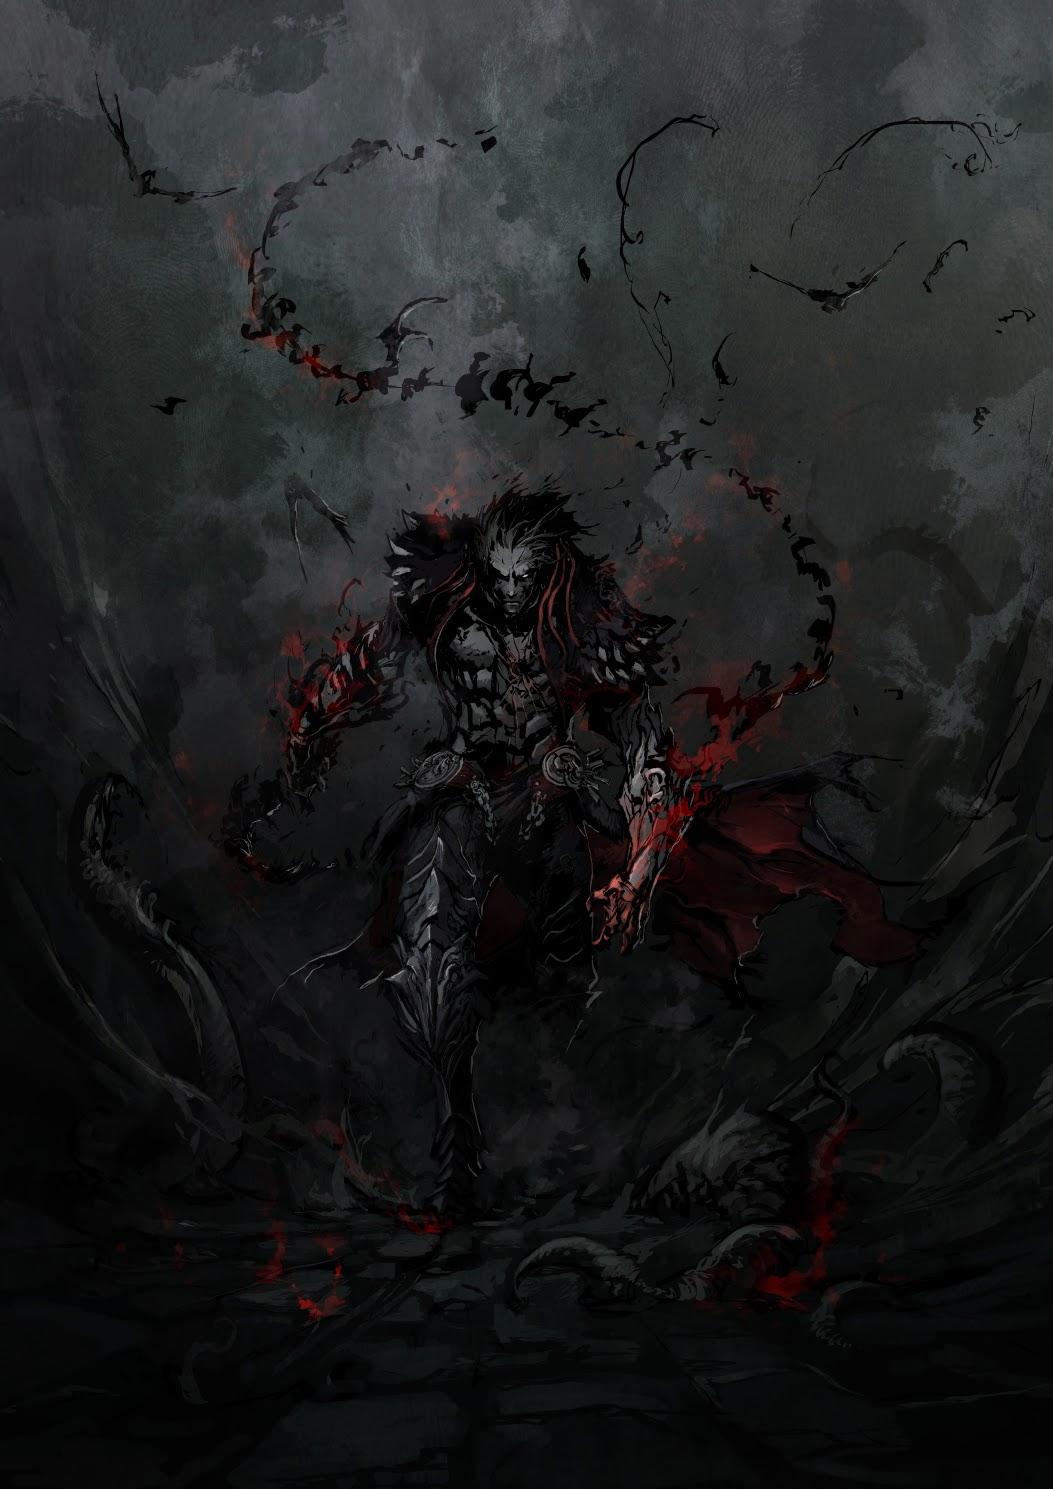 http://game-saga.com/wp-content/uploads/2018/12/castlevania-lords-of-shadow-2-artwork-2.jpg